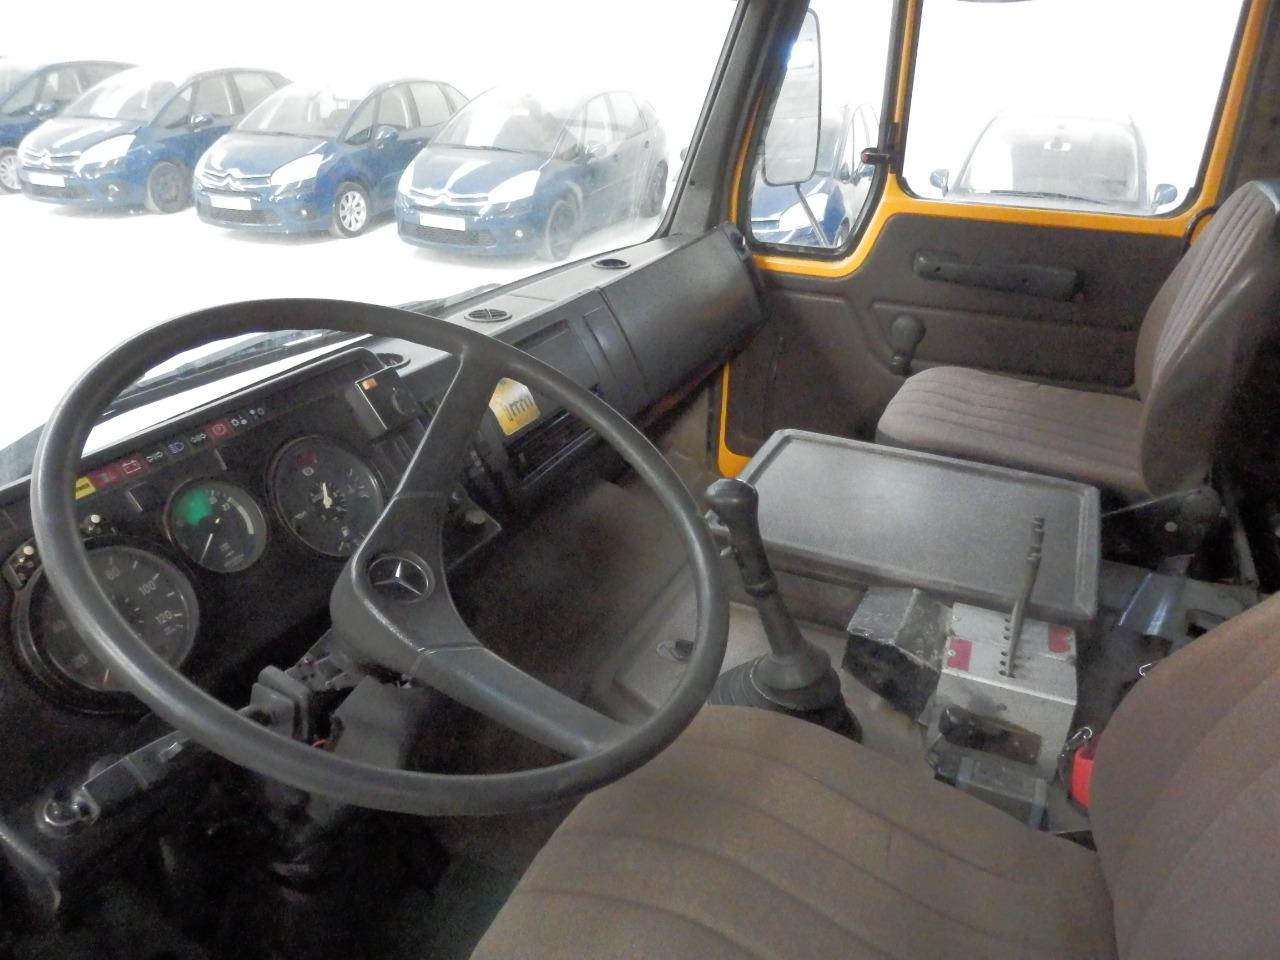 MercedesBenz_SK2233_Multilift_6x2_Palfinger-6